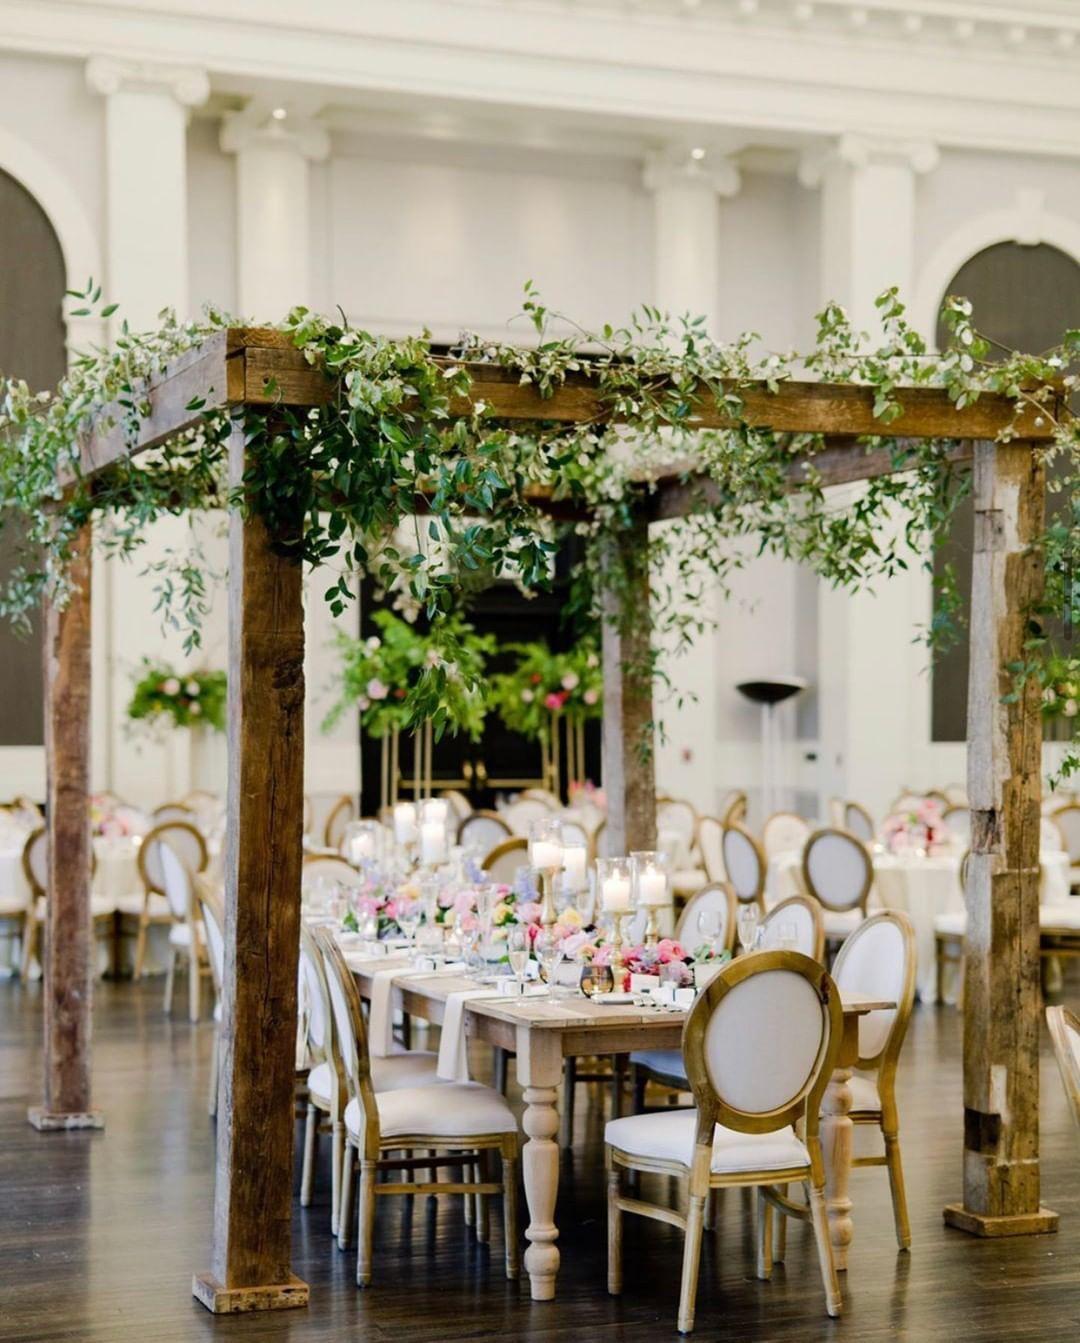 Wedding Decor Props Ideas And Inspiration Something Vintage Rentals In 2020 Stylish Wedding Decor Farm Table Wedding Wedding Backdrop